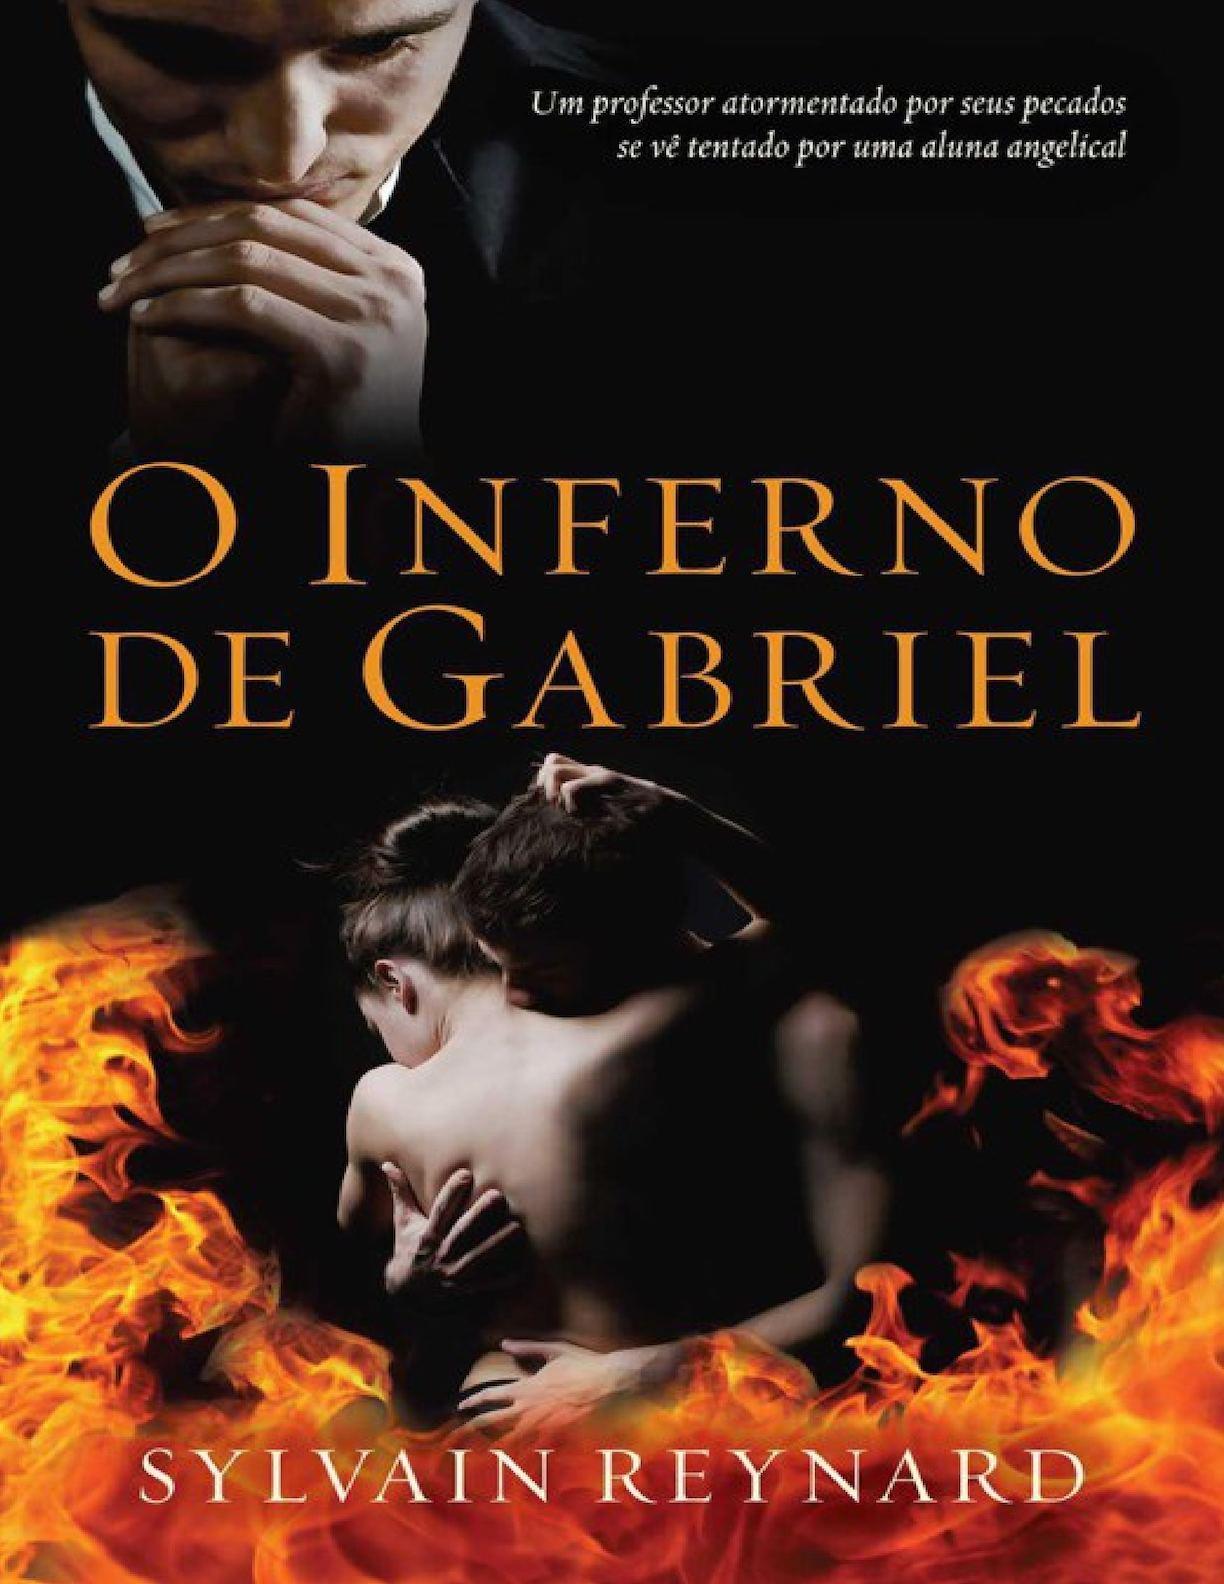 495b05af6 Calaméo - O Inferno De Gabriel Sylvain Reynard